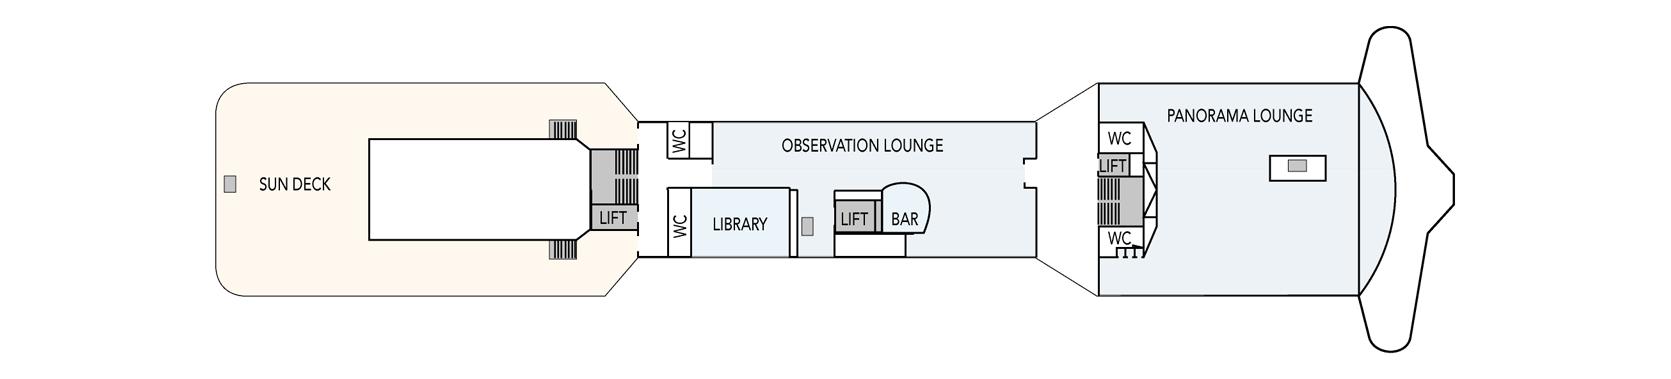 MS Polarlys-deckplan-Deck 7